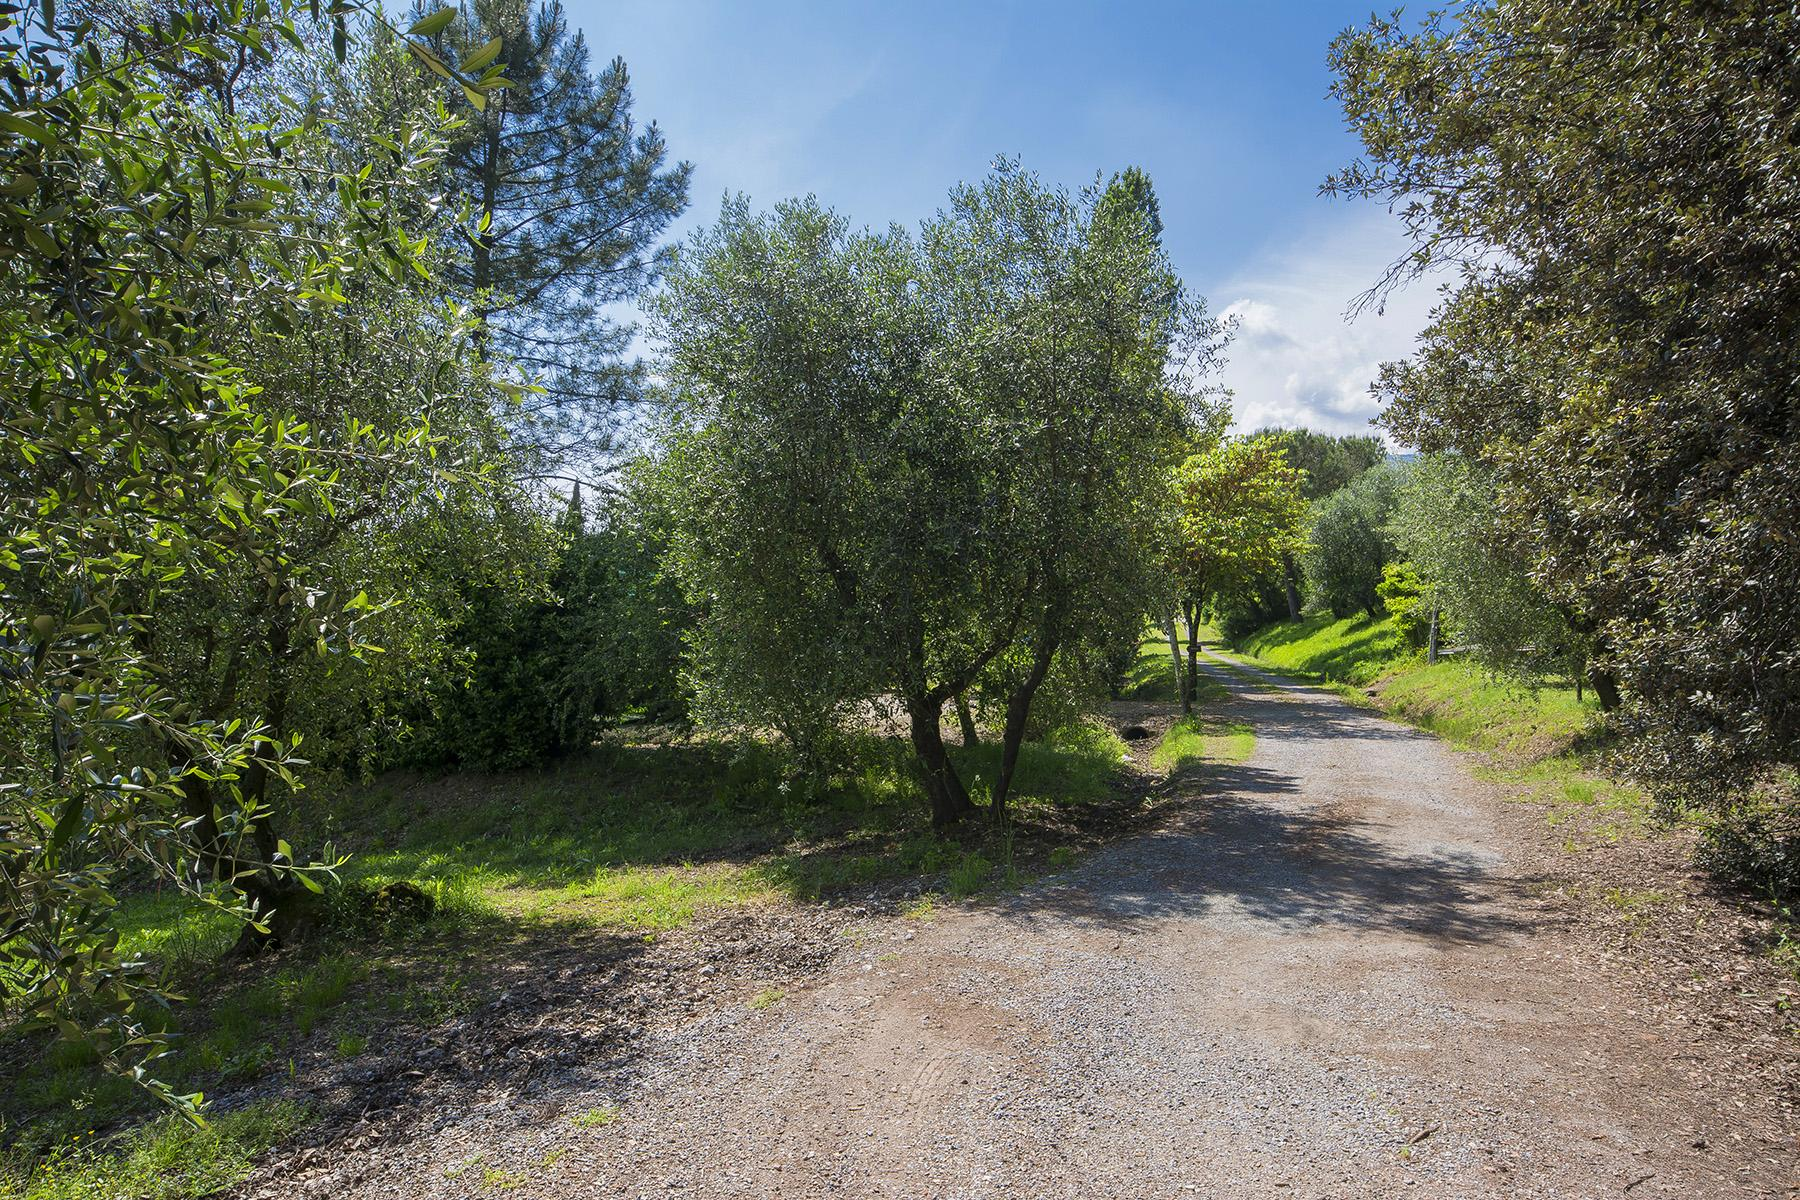 Pescia小山丘上美丽的乡间农舍 - 45